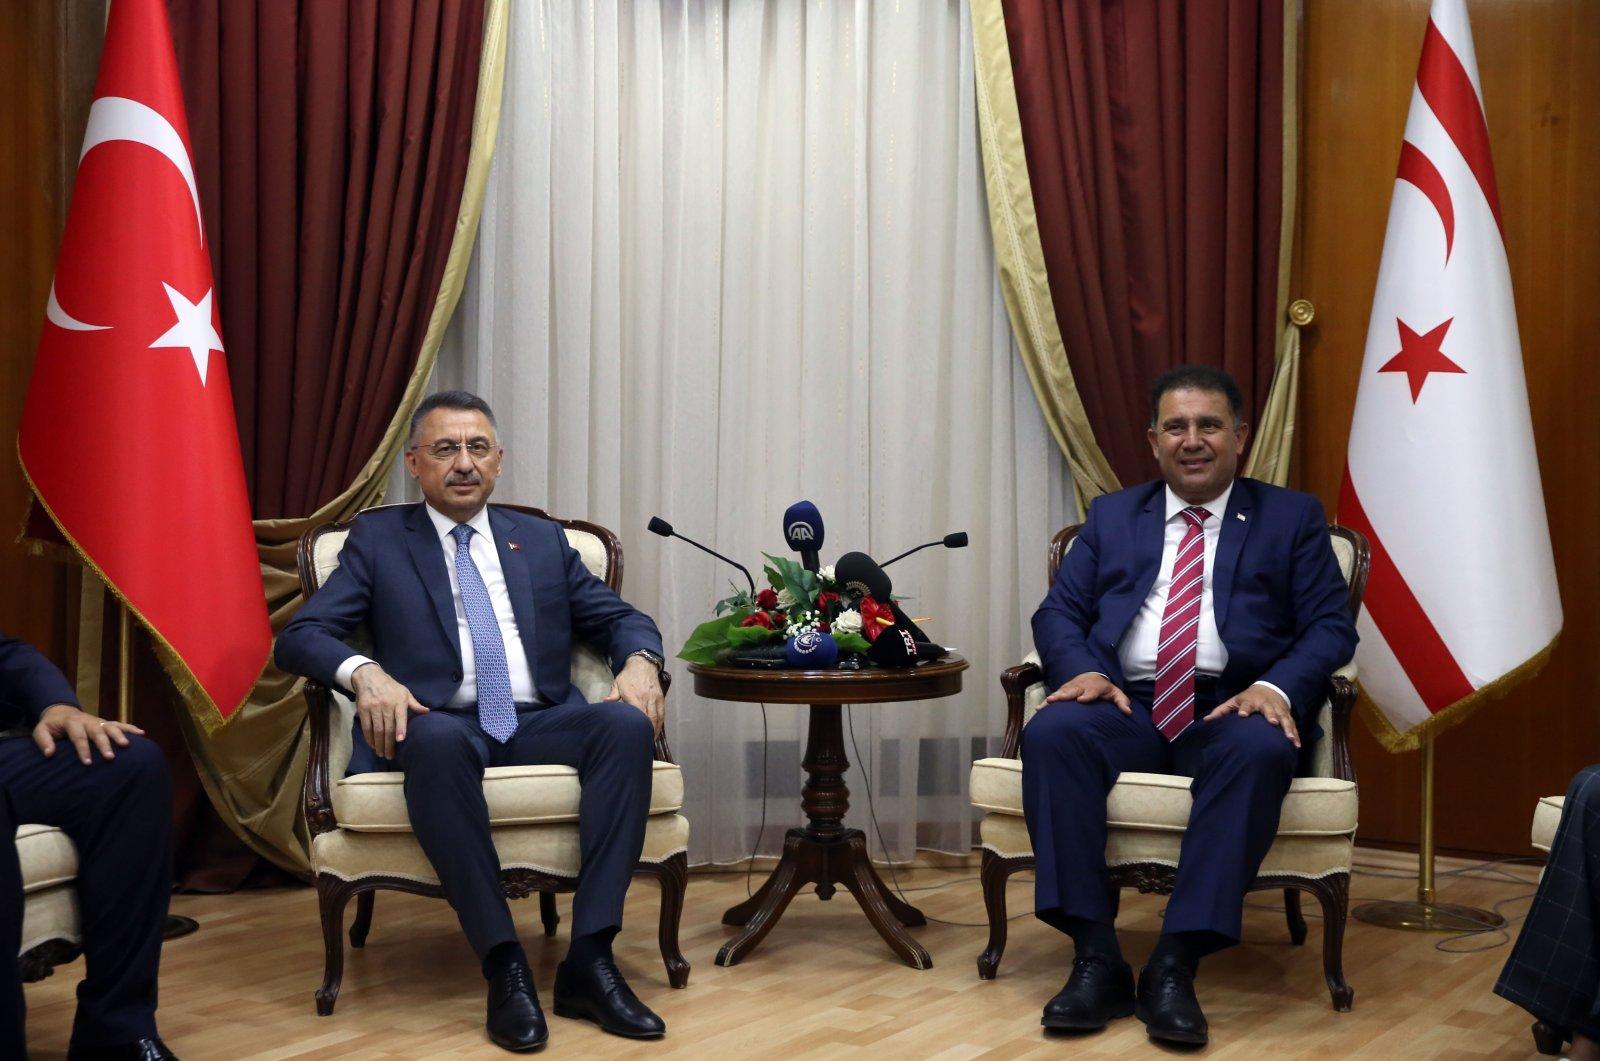 Turkey's Vice President Fuat Oktay and Turkish Cypriot Prime Minister Ersan Saner in capital Lefkoşa (Nicosia), Turkish Cyprus, July 7, 2021. (AA Photo)